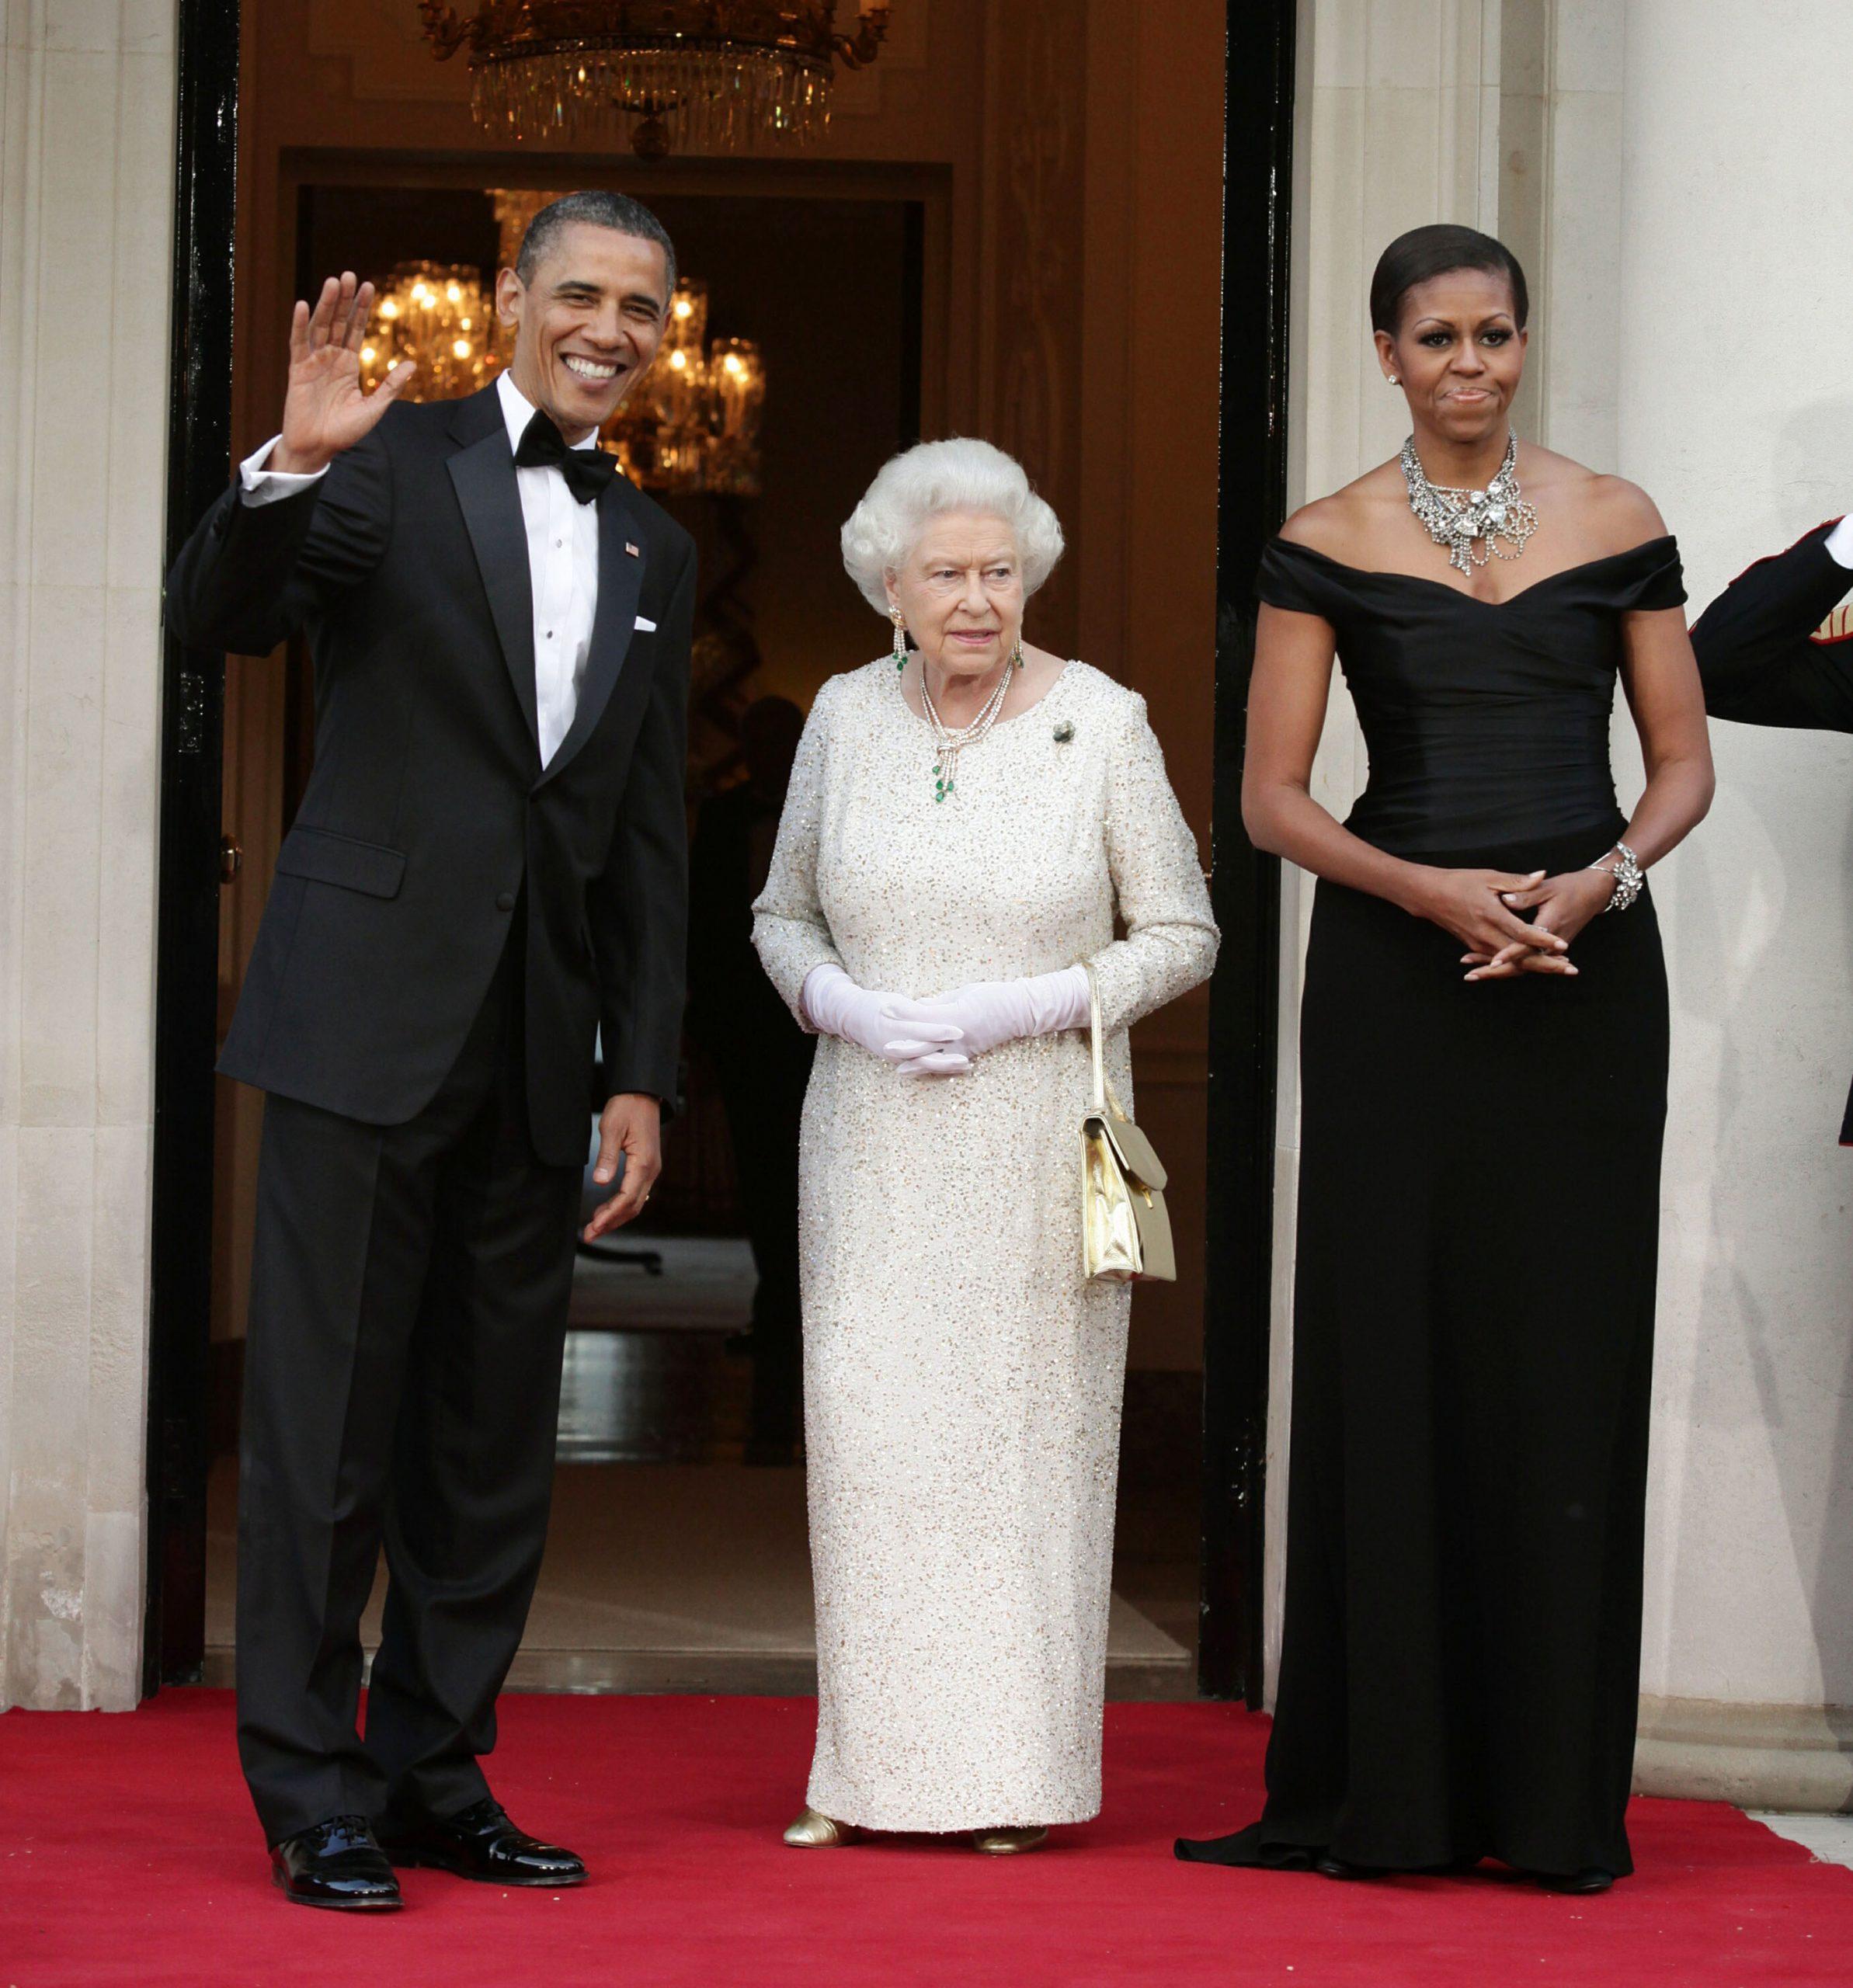 En la imagen, la Reina Isabel II con Michelle y Barack Obama. /Foto: Getty